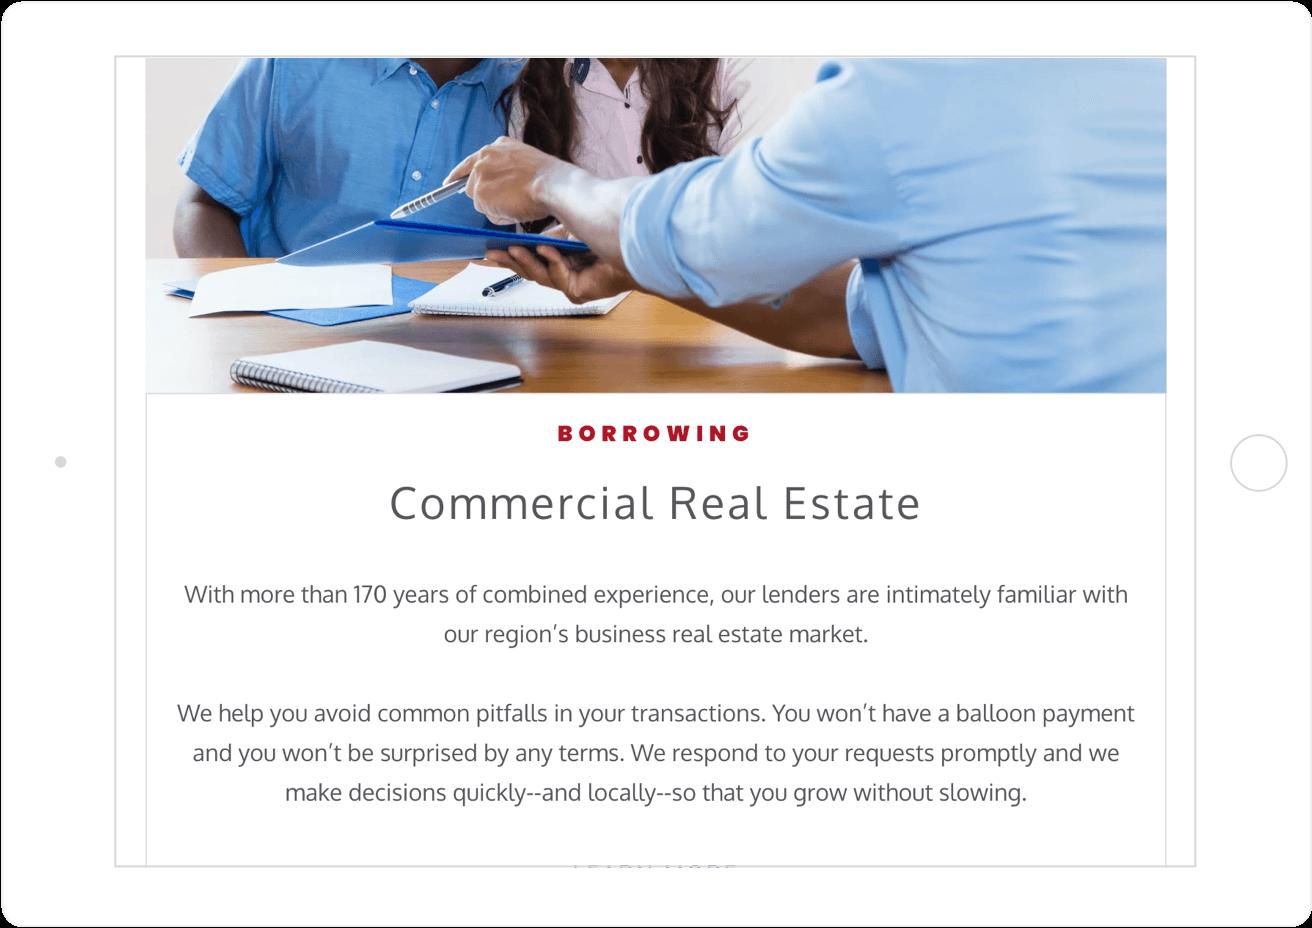 Crews Bank Corp Website Copy